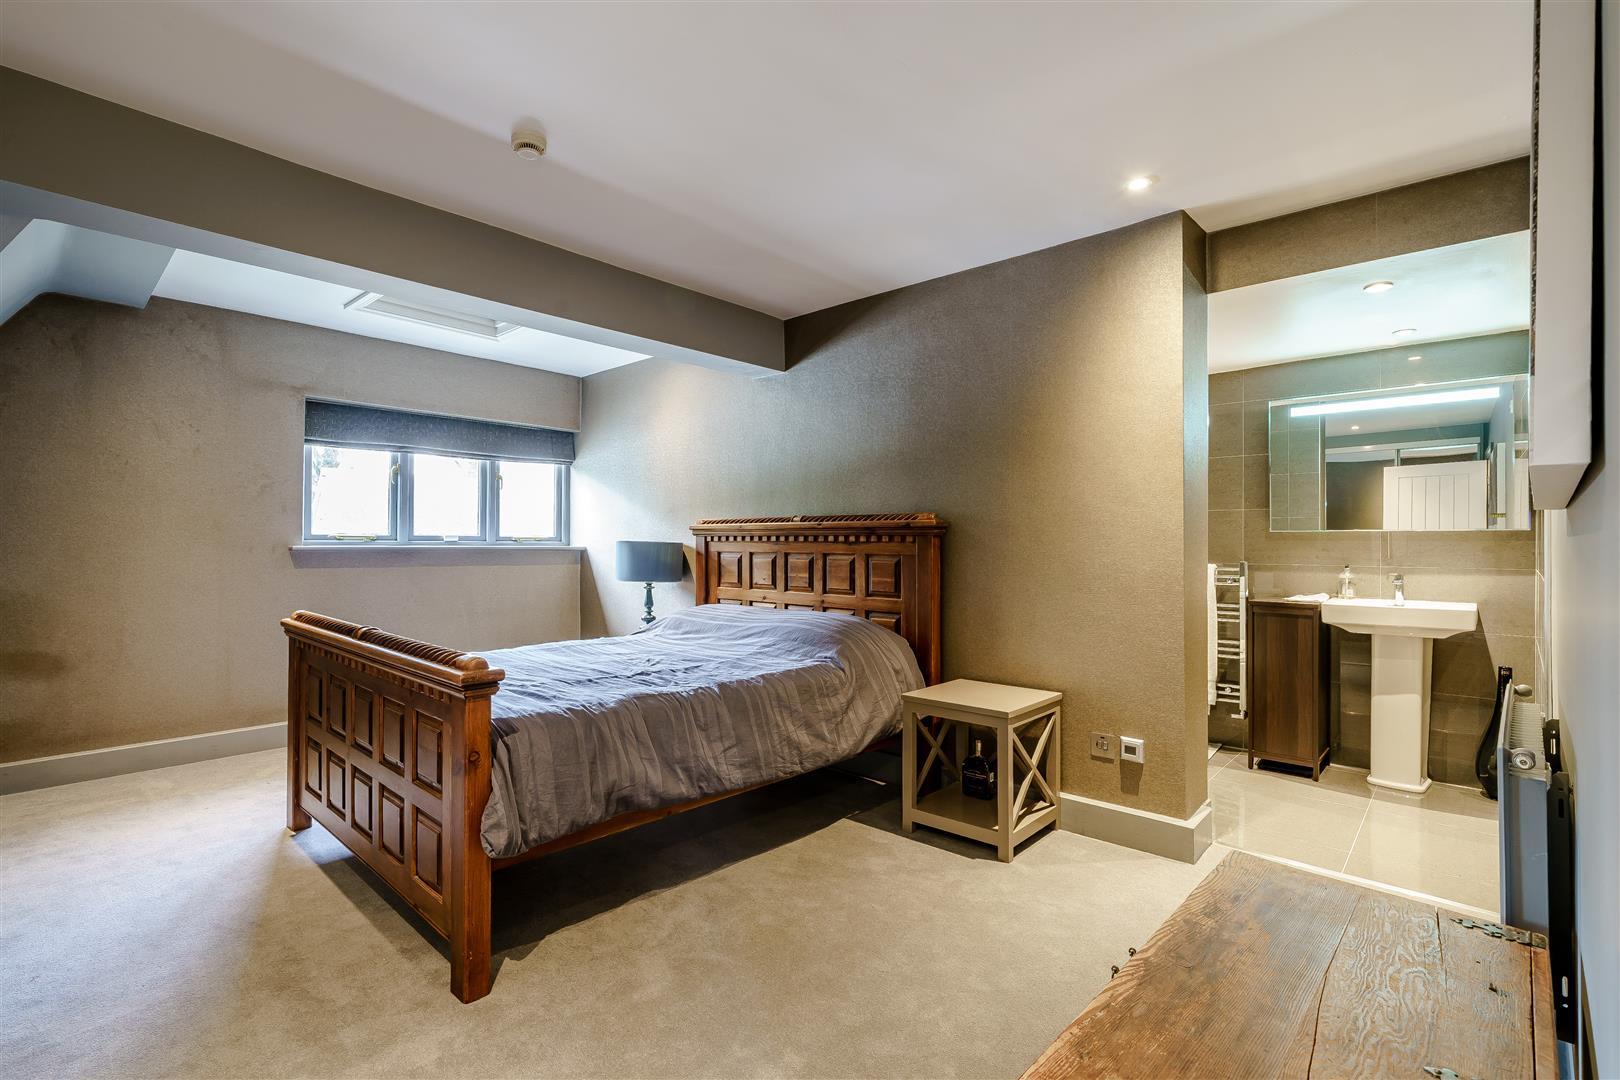 Rowstock Manor - Gallery Image 21 - Bedroom 4